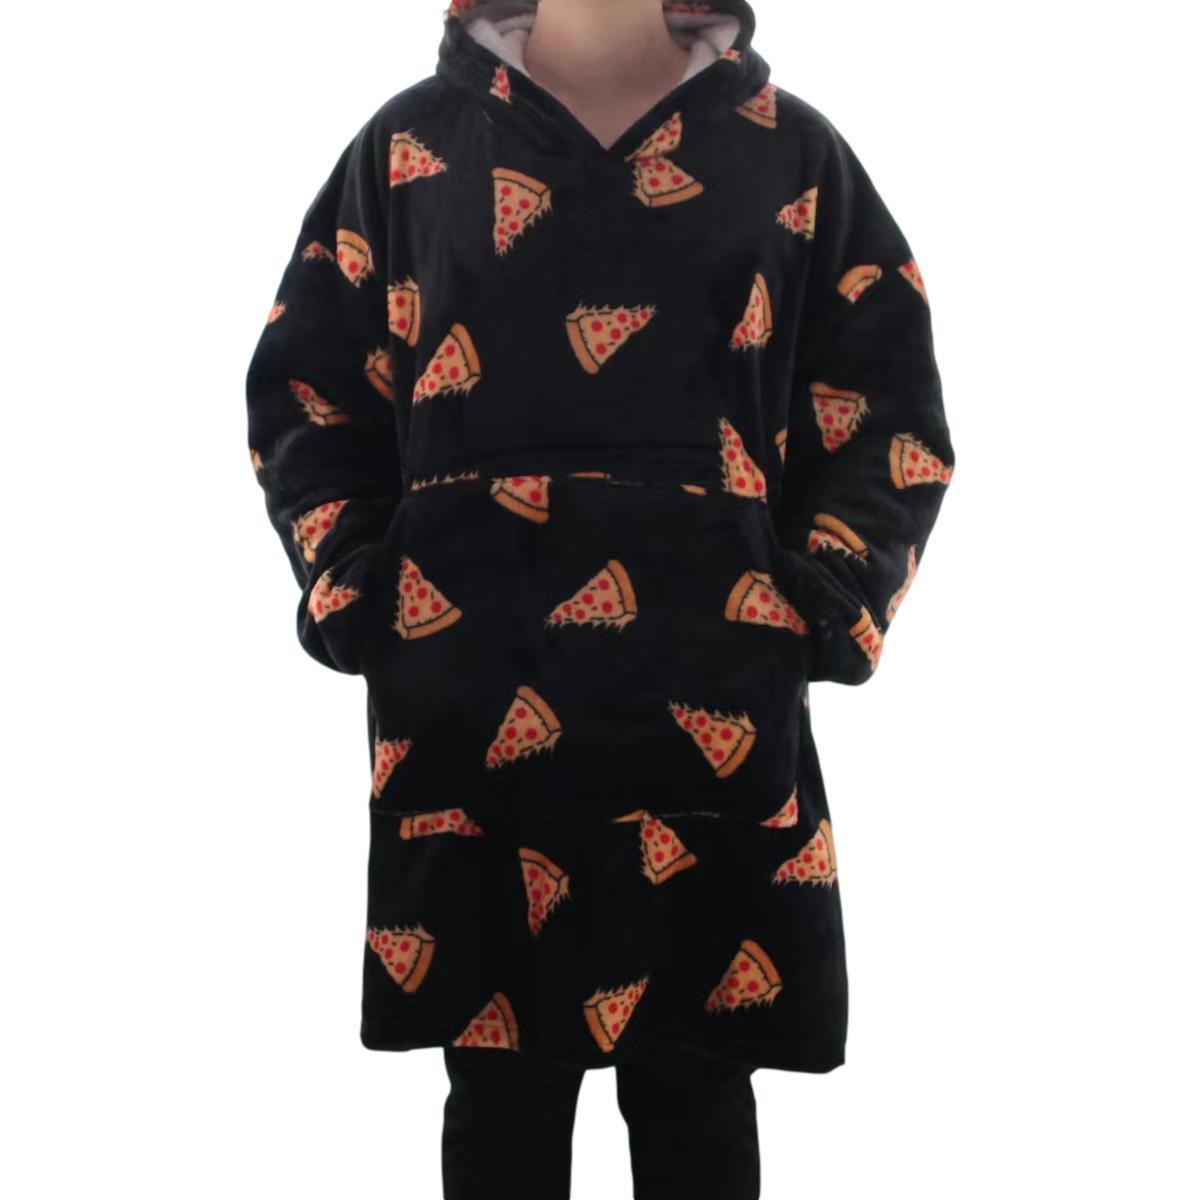 FIL Oversized Hoodie Blanket Oodie Plush Warm Big Fleece Soft Winter Pullover [Design: Blue with Bears]